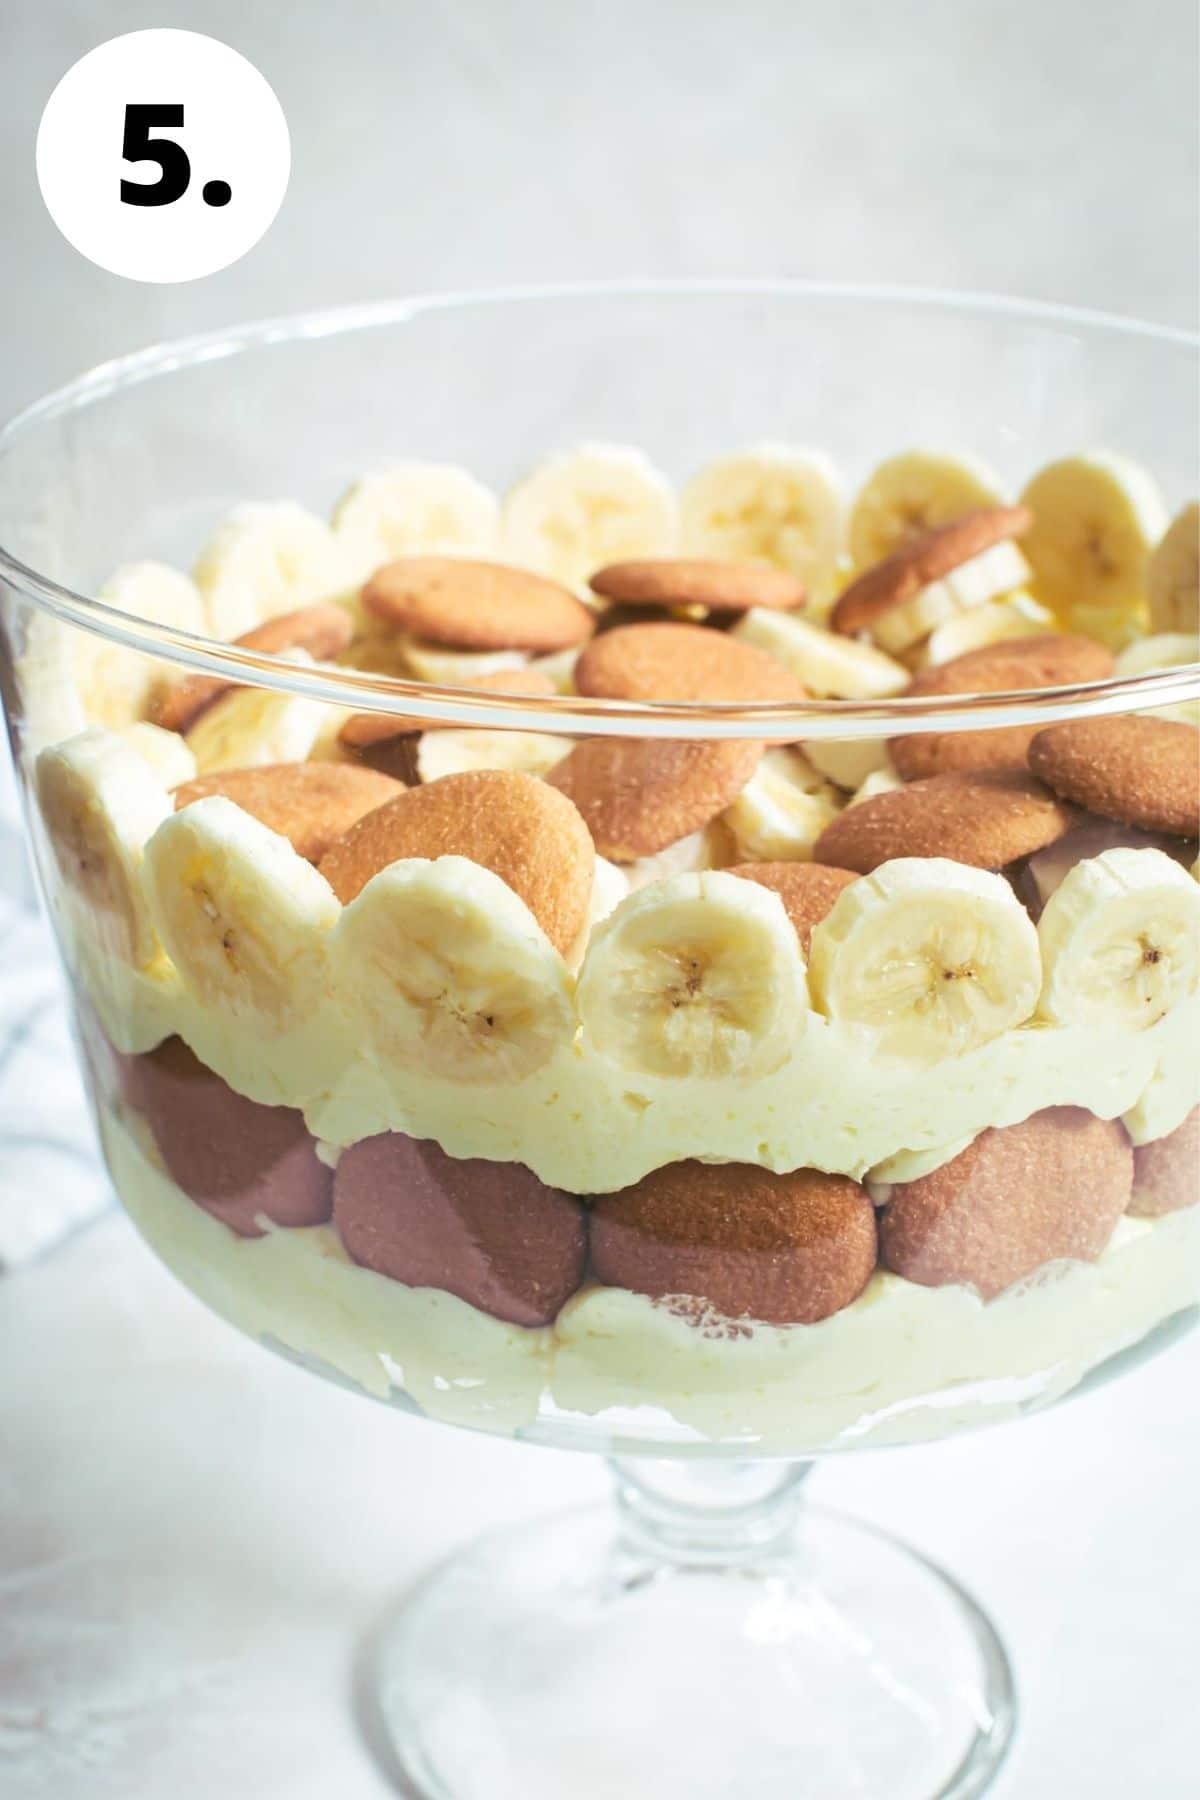 Banana pudding process step 5.